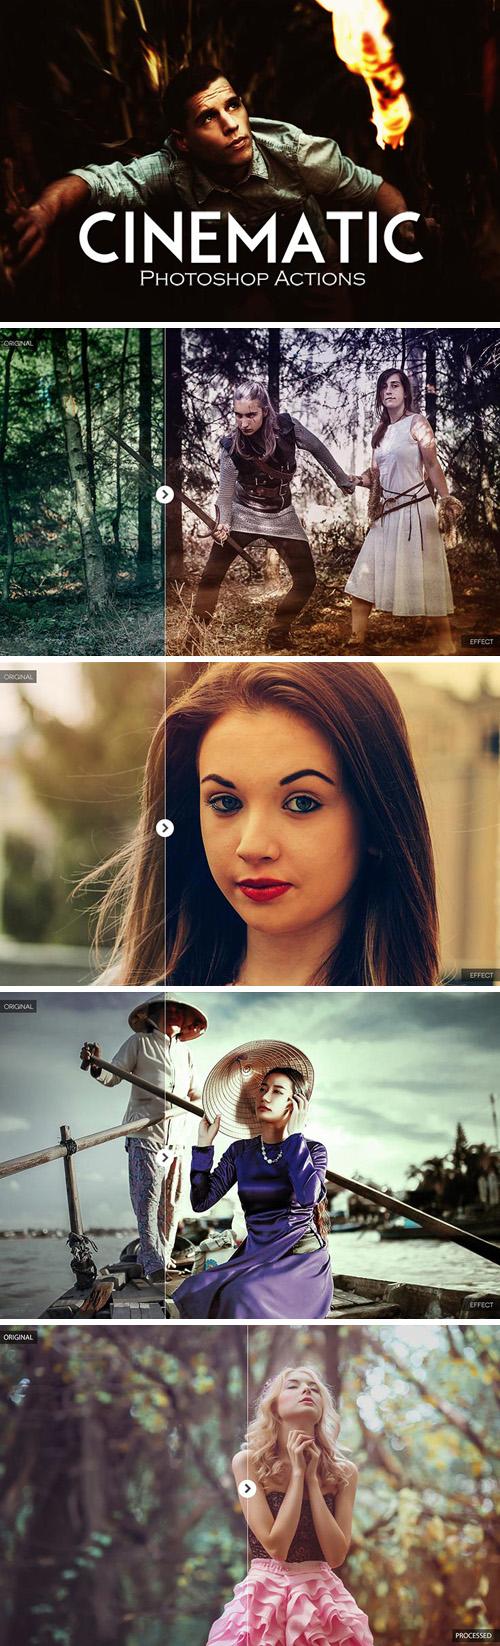 10 Cinematic Photoshop Actions